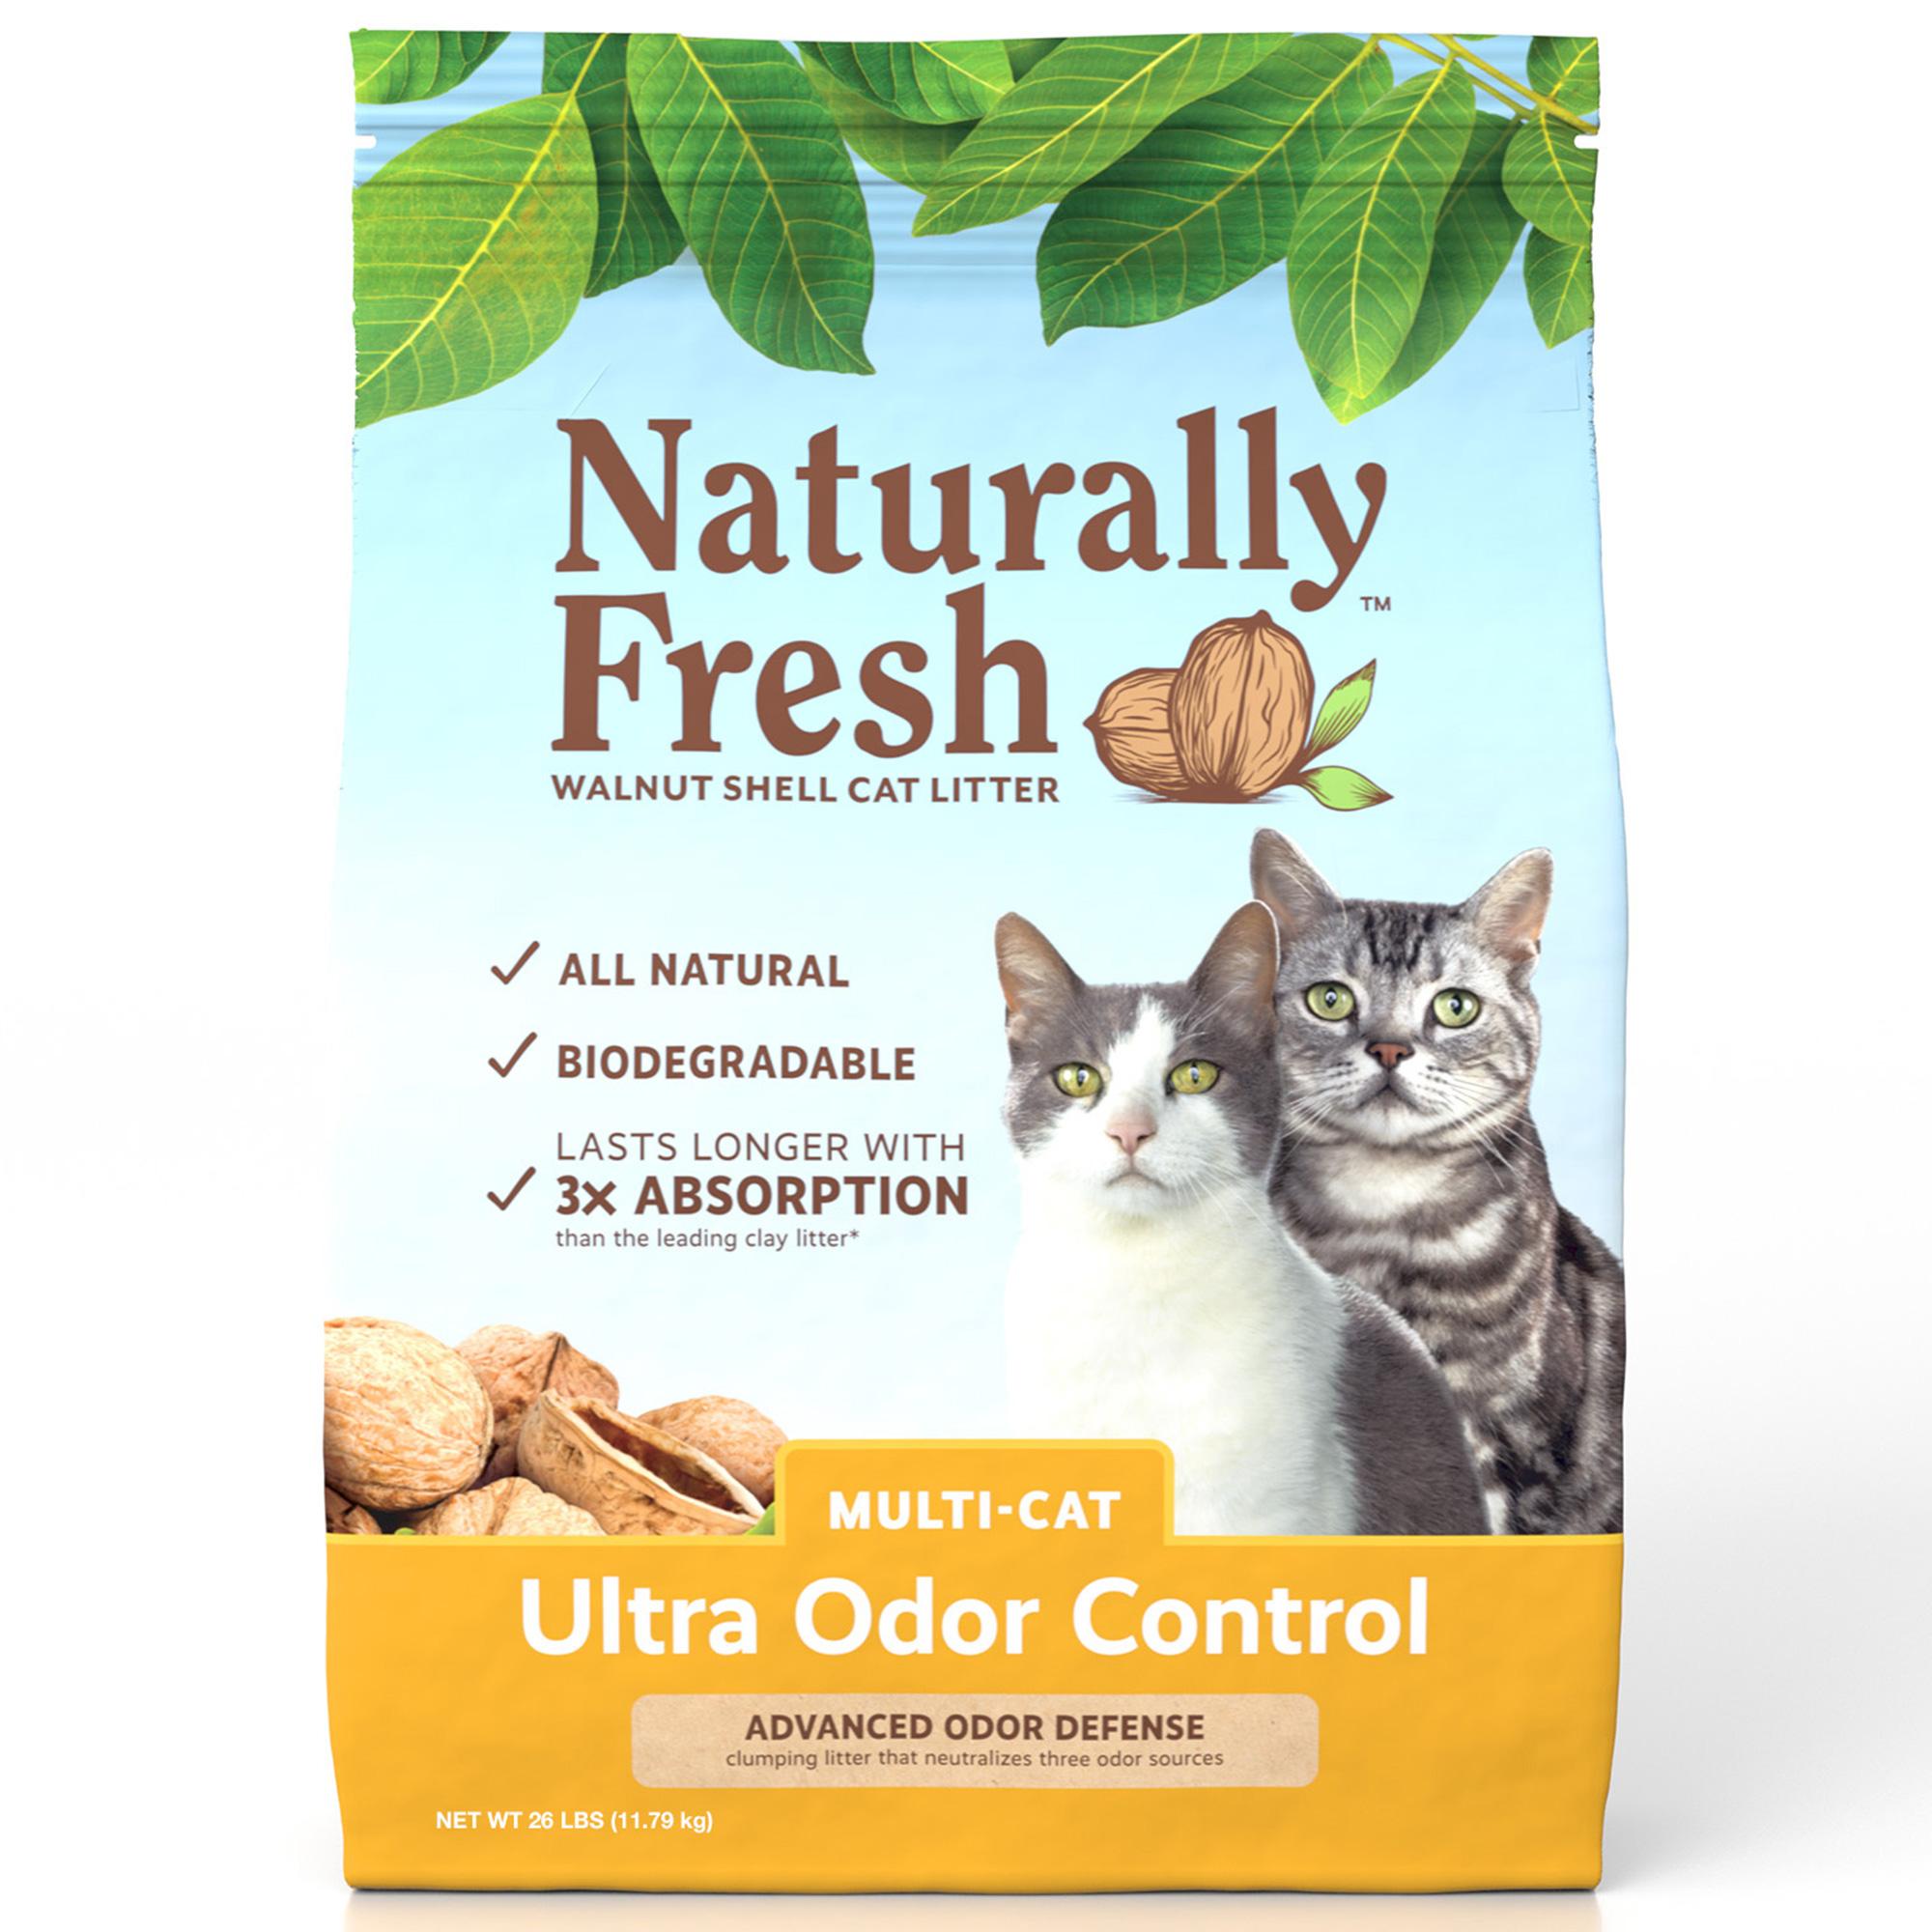 Naturally Fresh Walnut-Based Multi-Cat Ultra Odor Control Quick-Clumping Cat Litter, 26-lb bag